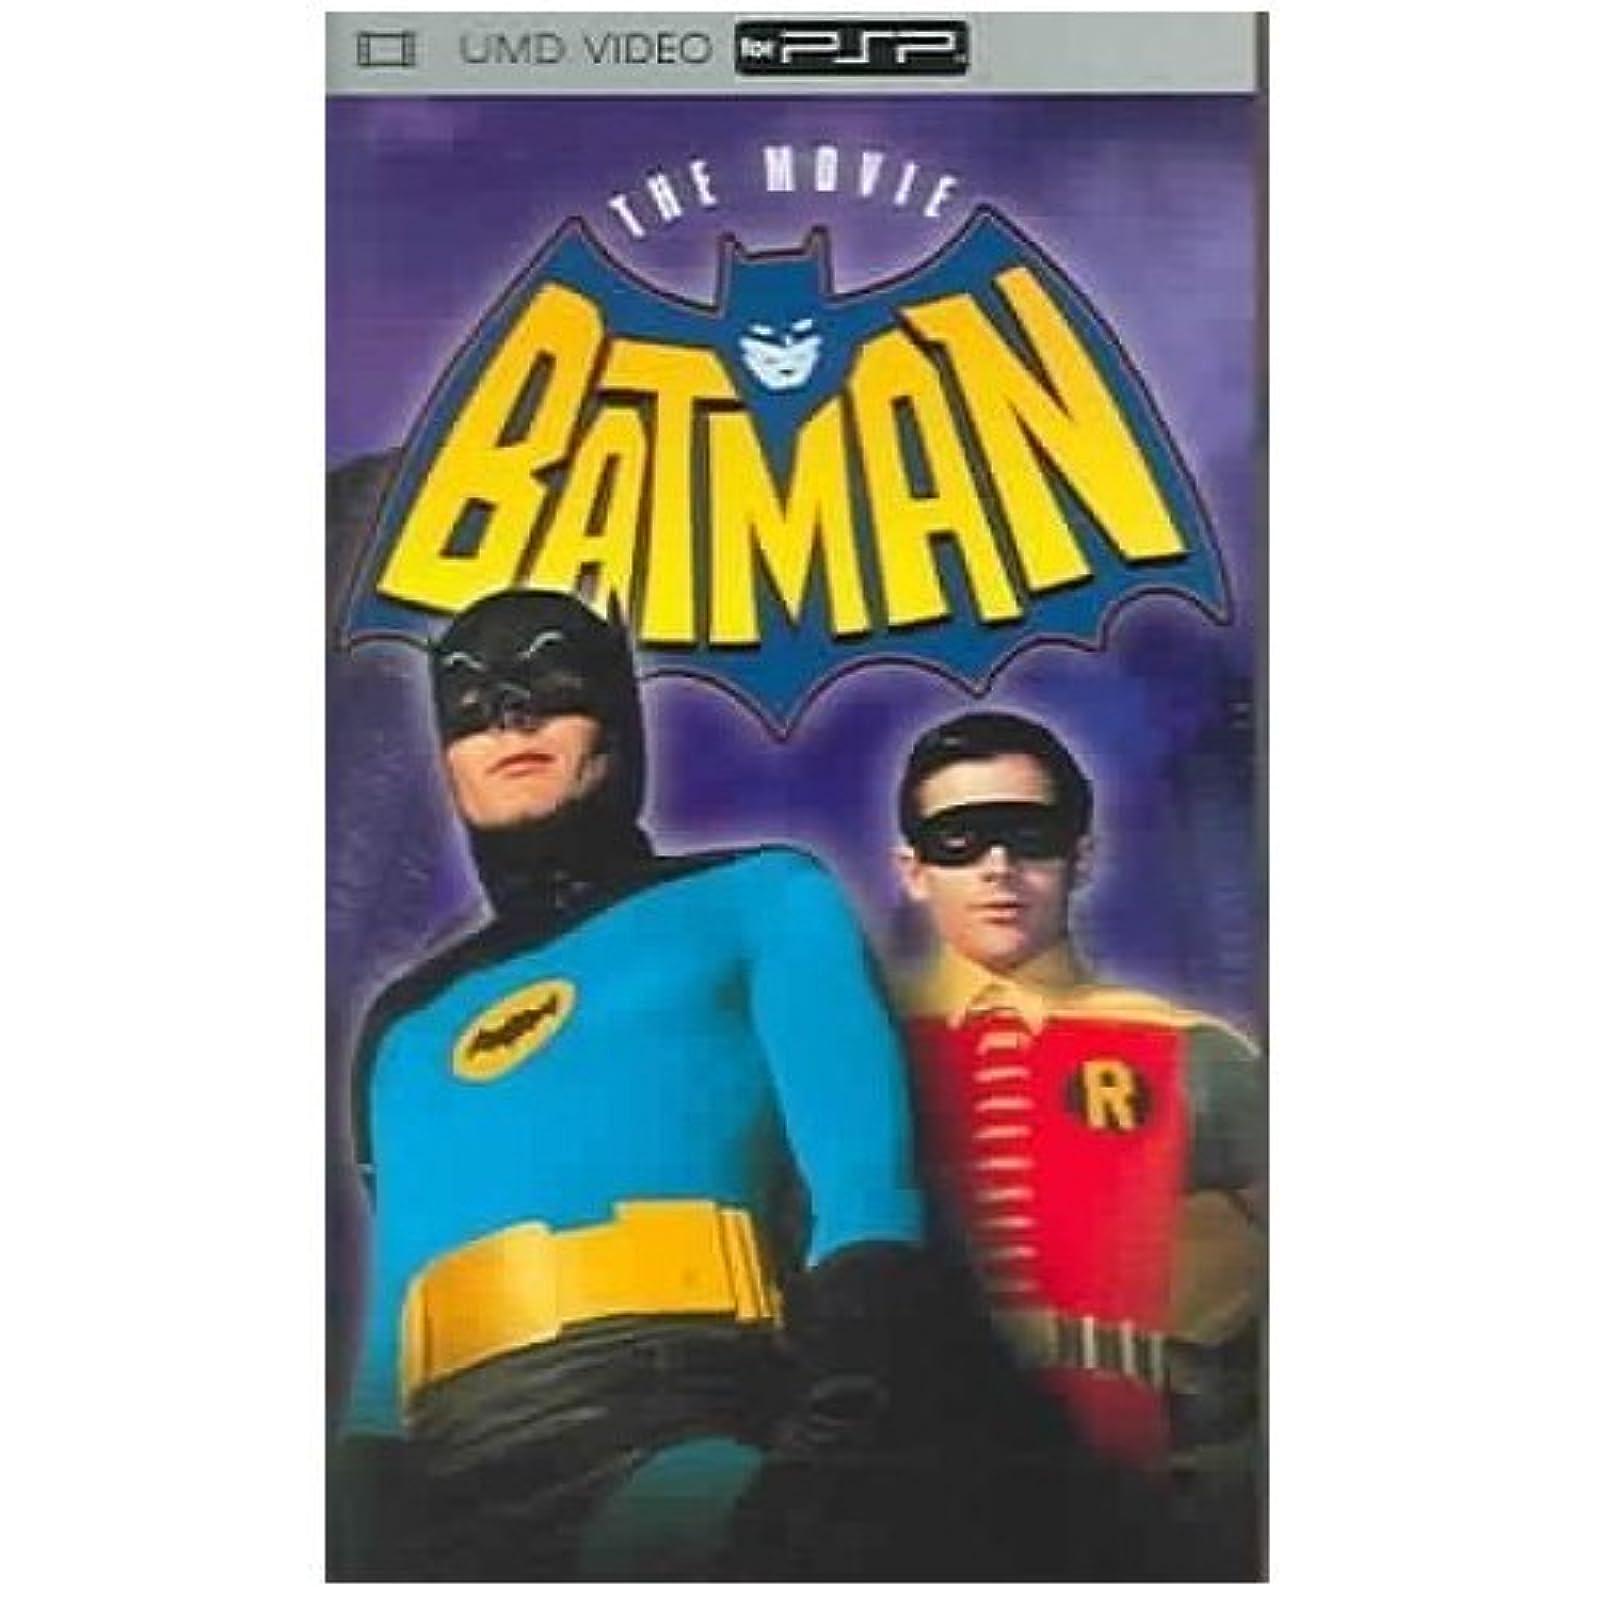 Batman The Movie / 35th Anniversary Edition UMD For PSP